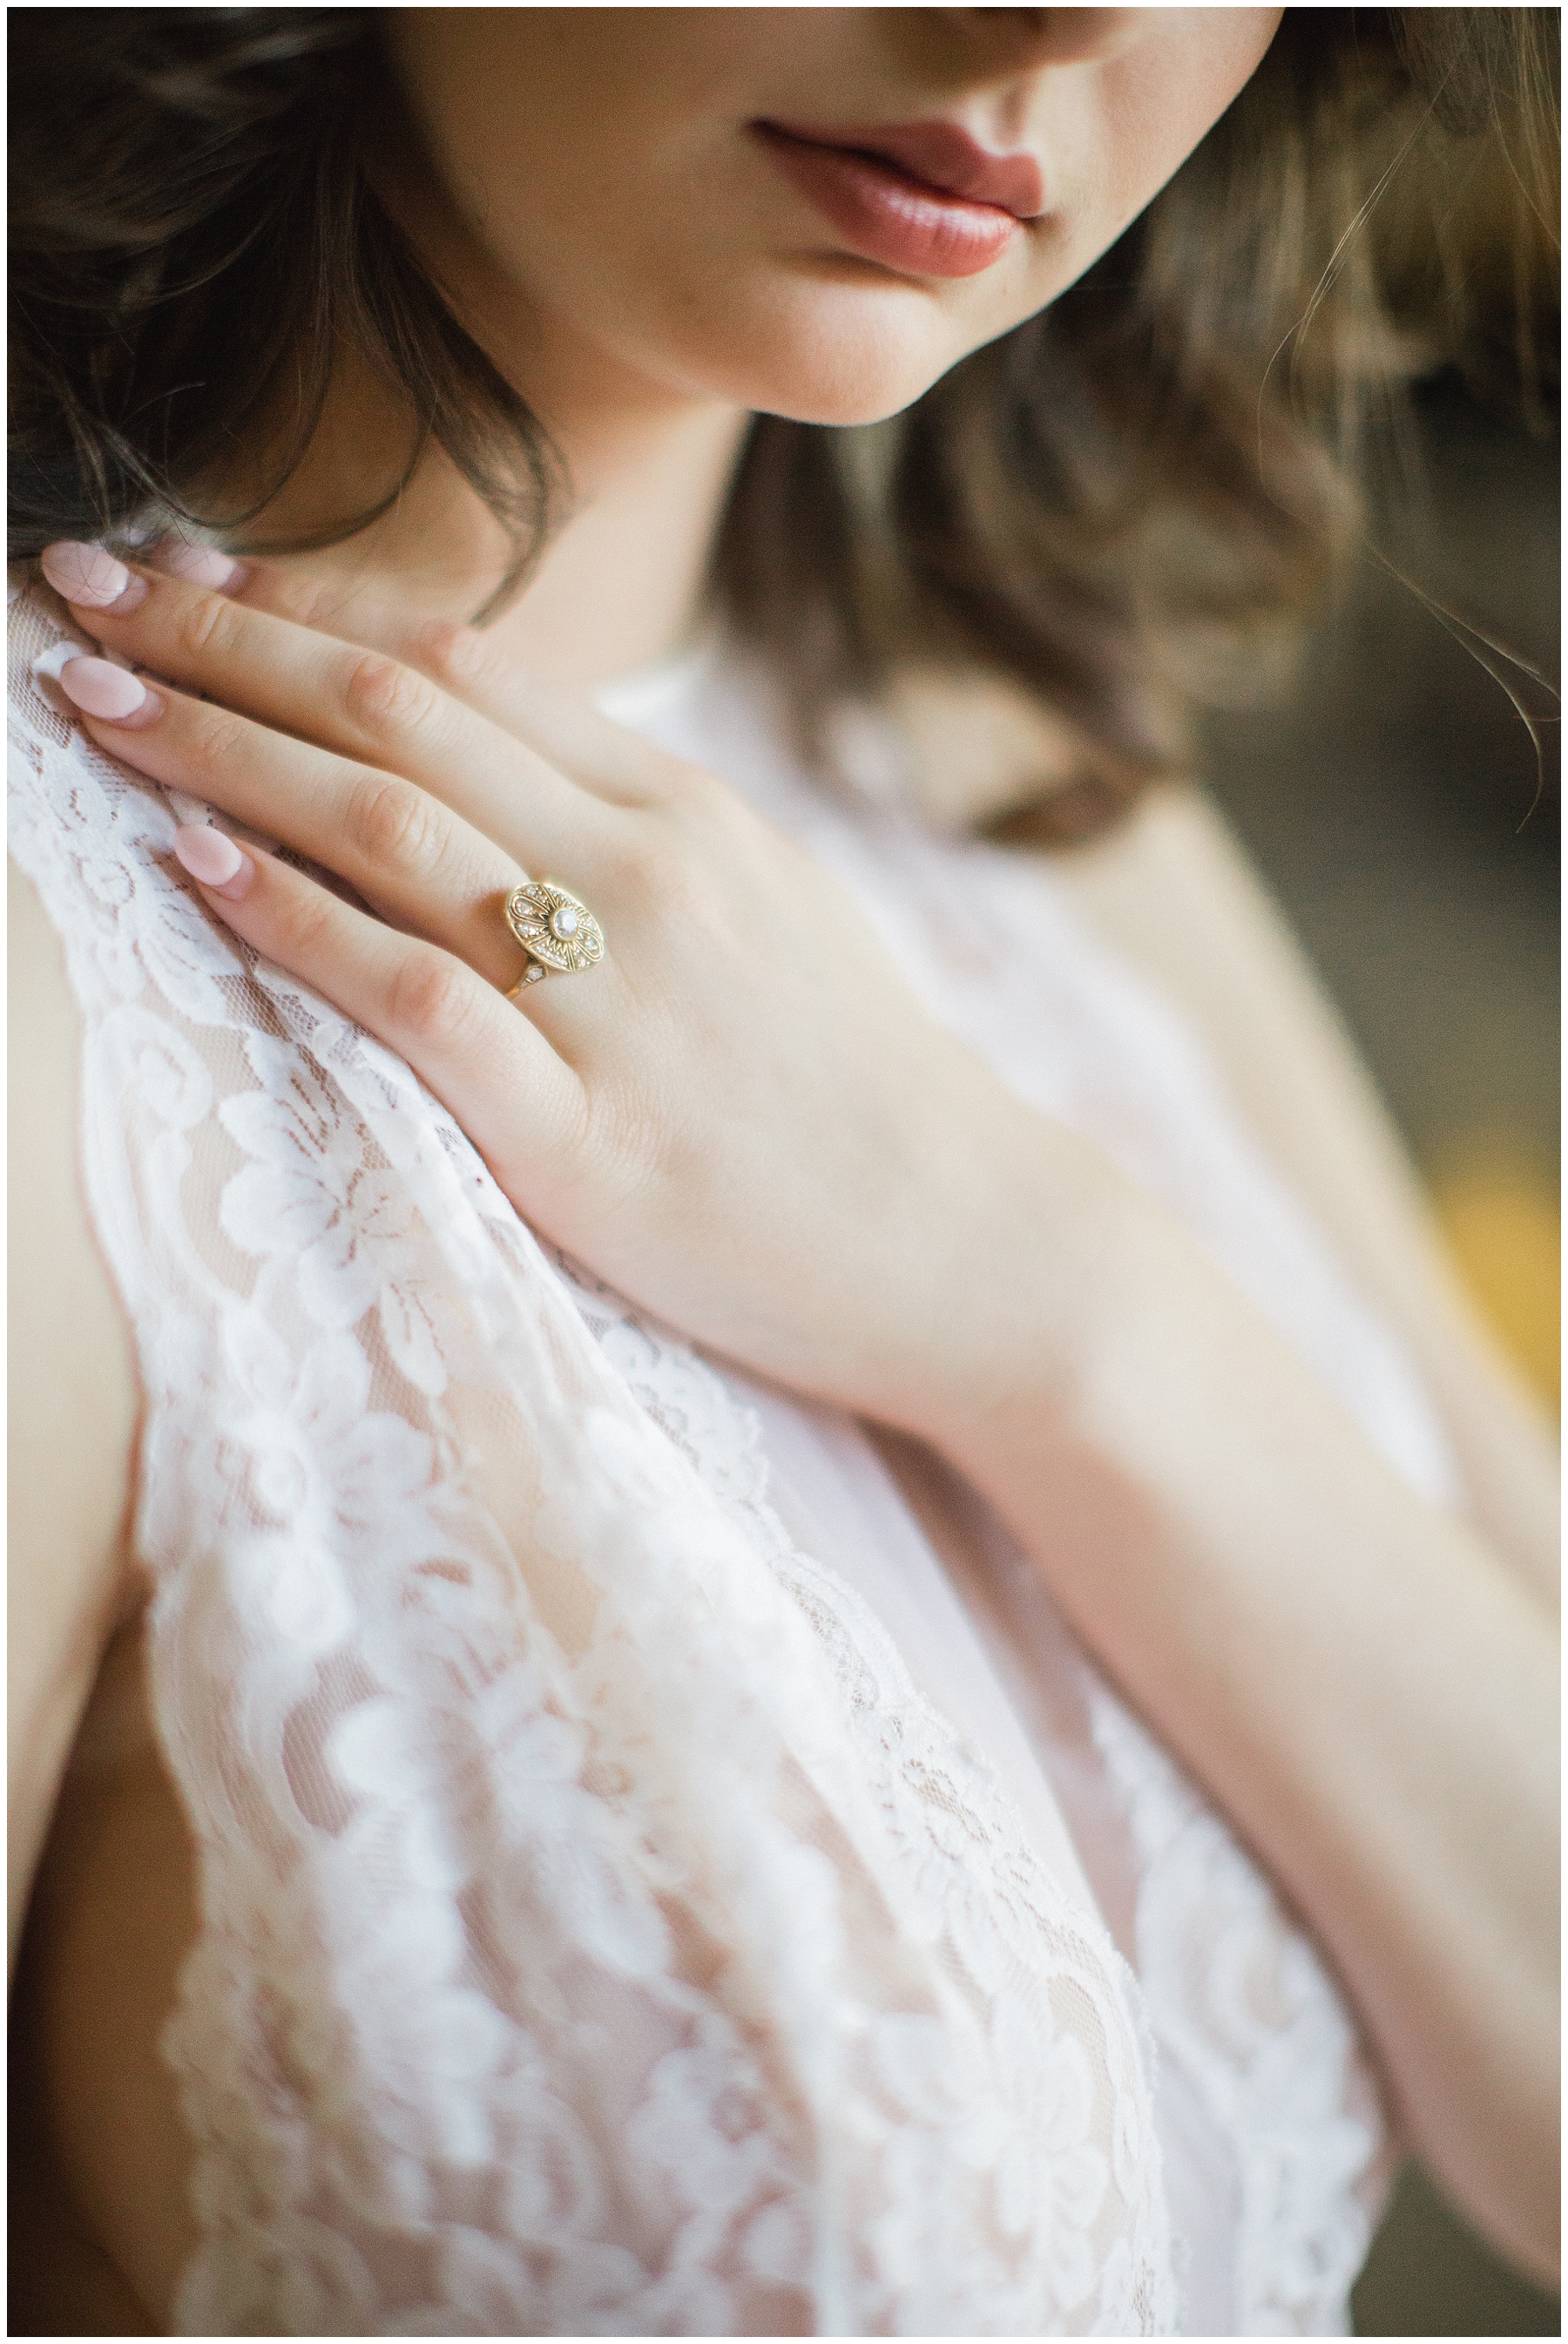 Fairmont_Banff_Springs_Wedding_Inspiration_ParrishHousePhotos_001_blog.jpg